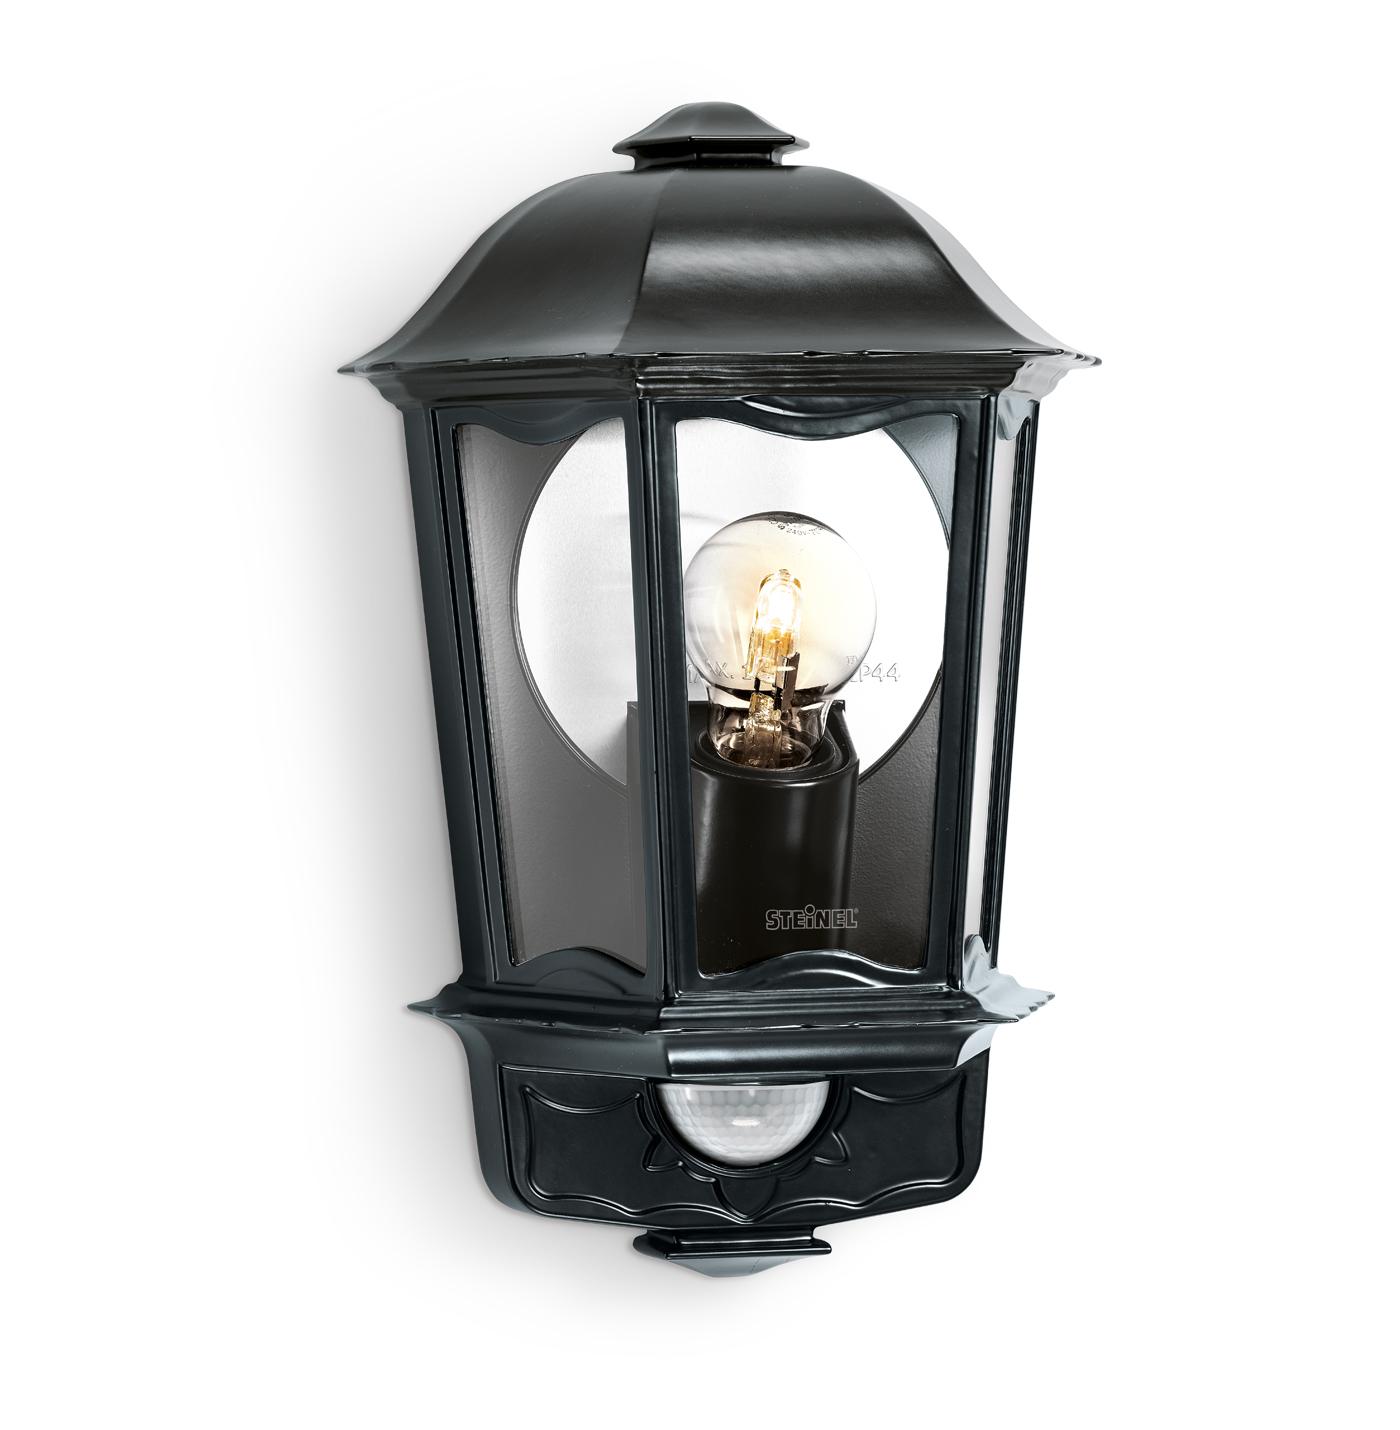 steinel sensorleuchte l 190 s schwarz 644413. Black Bedroom Furniture Sets. Home Design Ideas